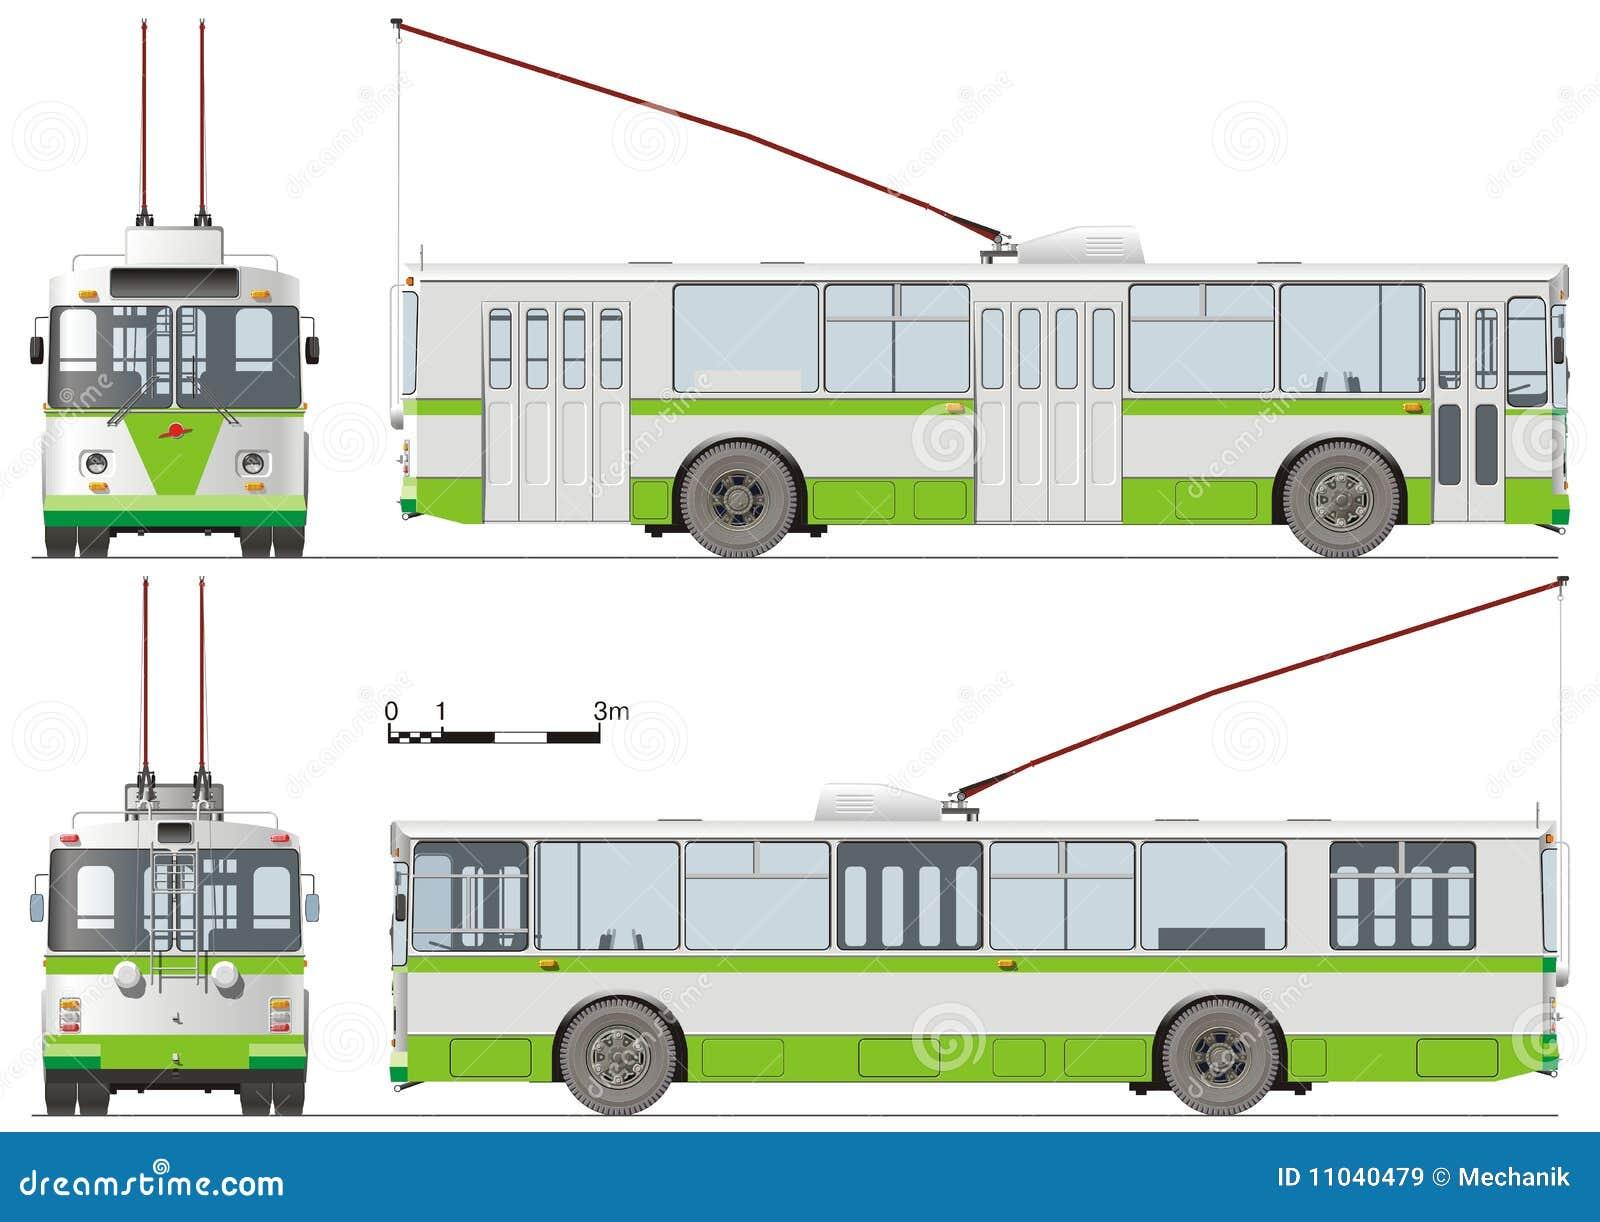 Au service de Dieu Urban-trolleybus-isolated-11040479